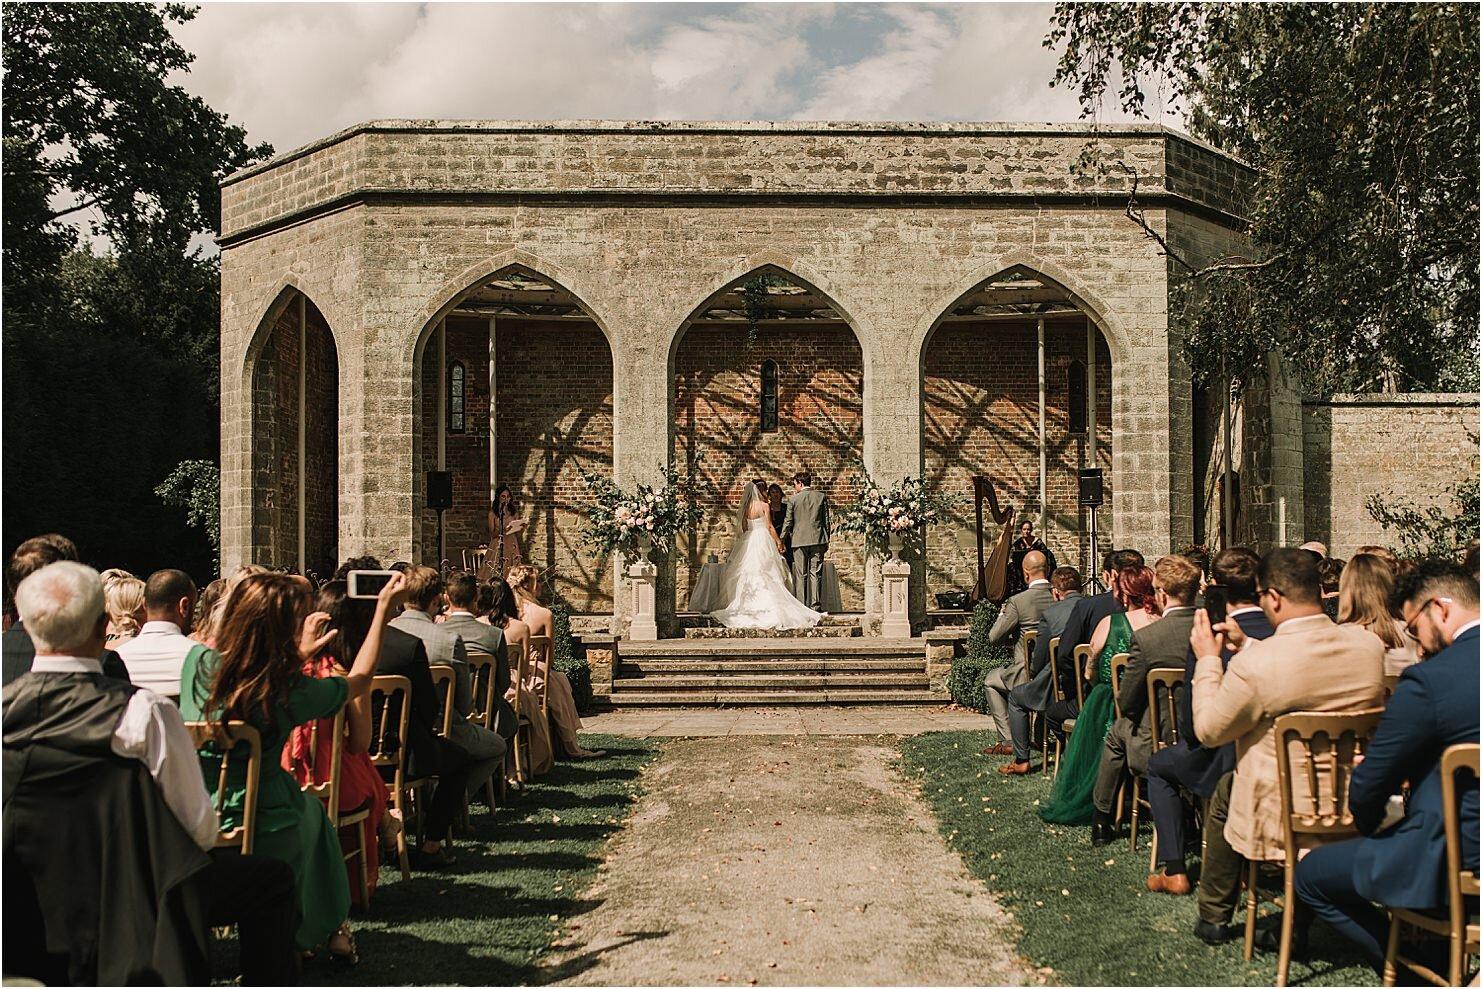 boda-de-cuento-en-castillo-boda-en-londres-51.jpg